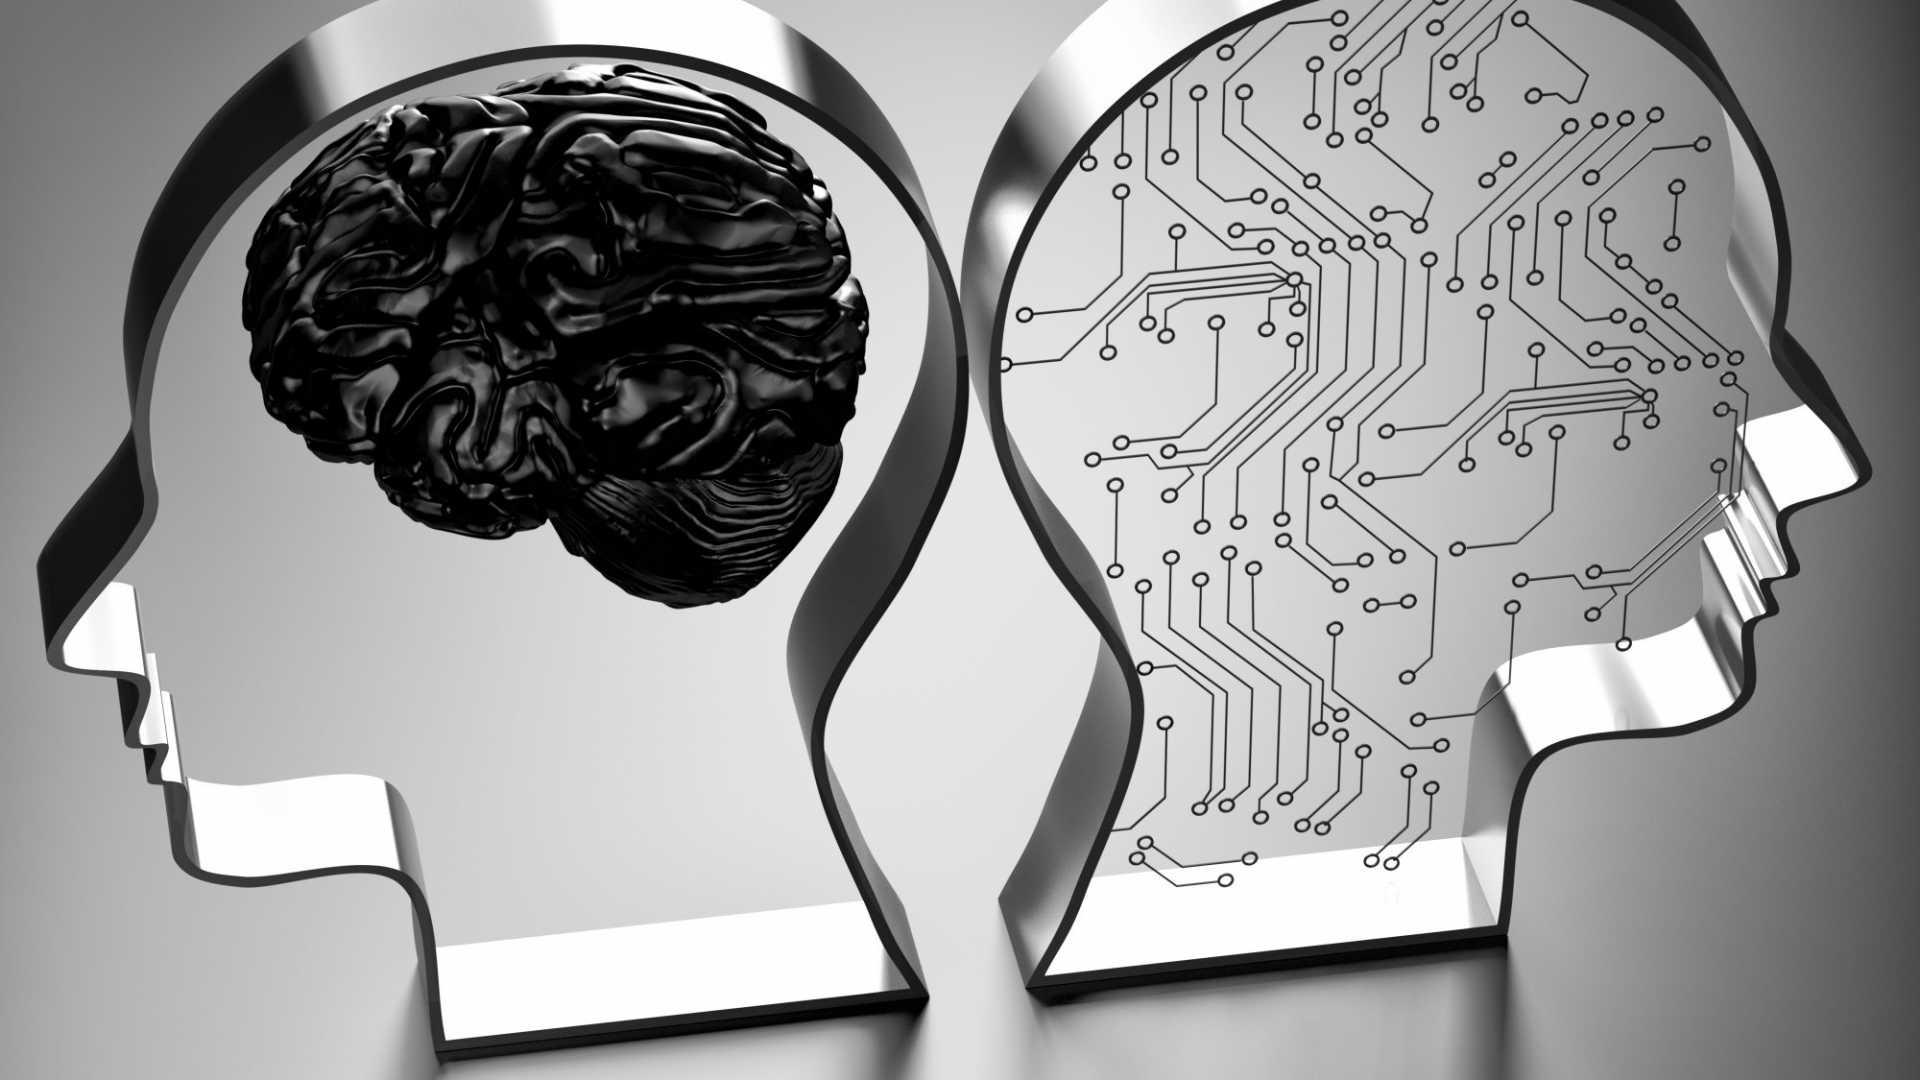 Is AI Powered Creativity A Threat or Advantage?